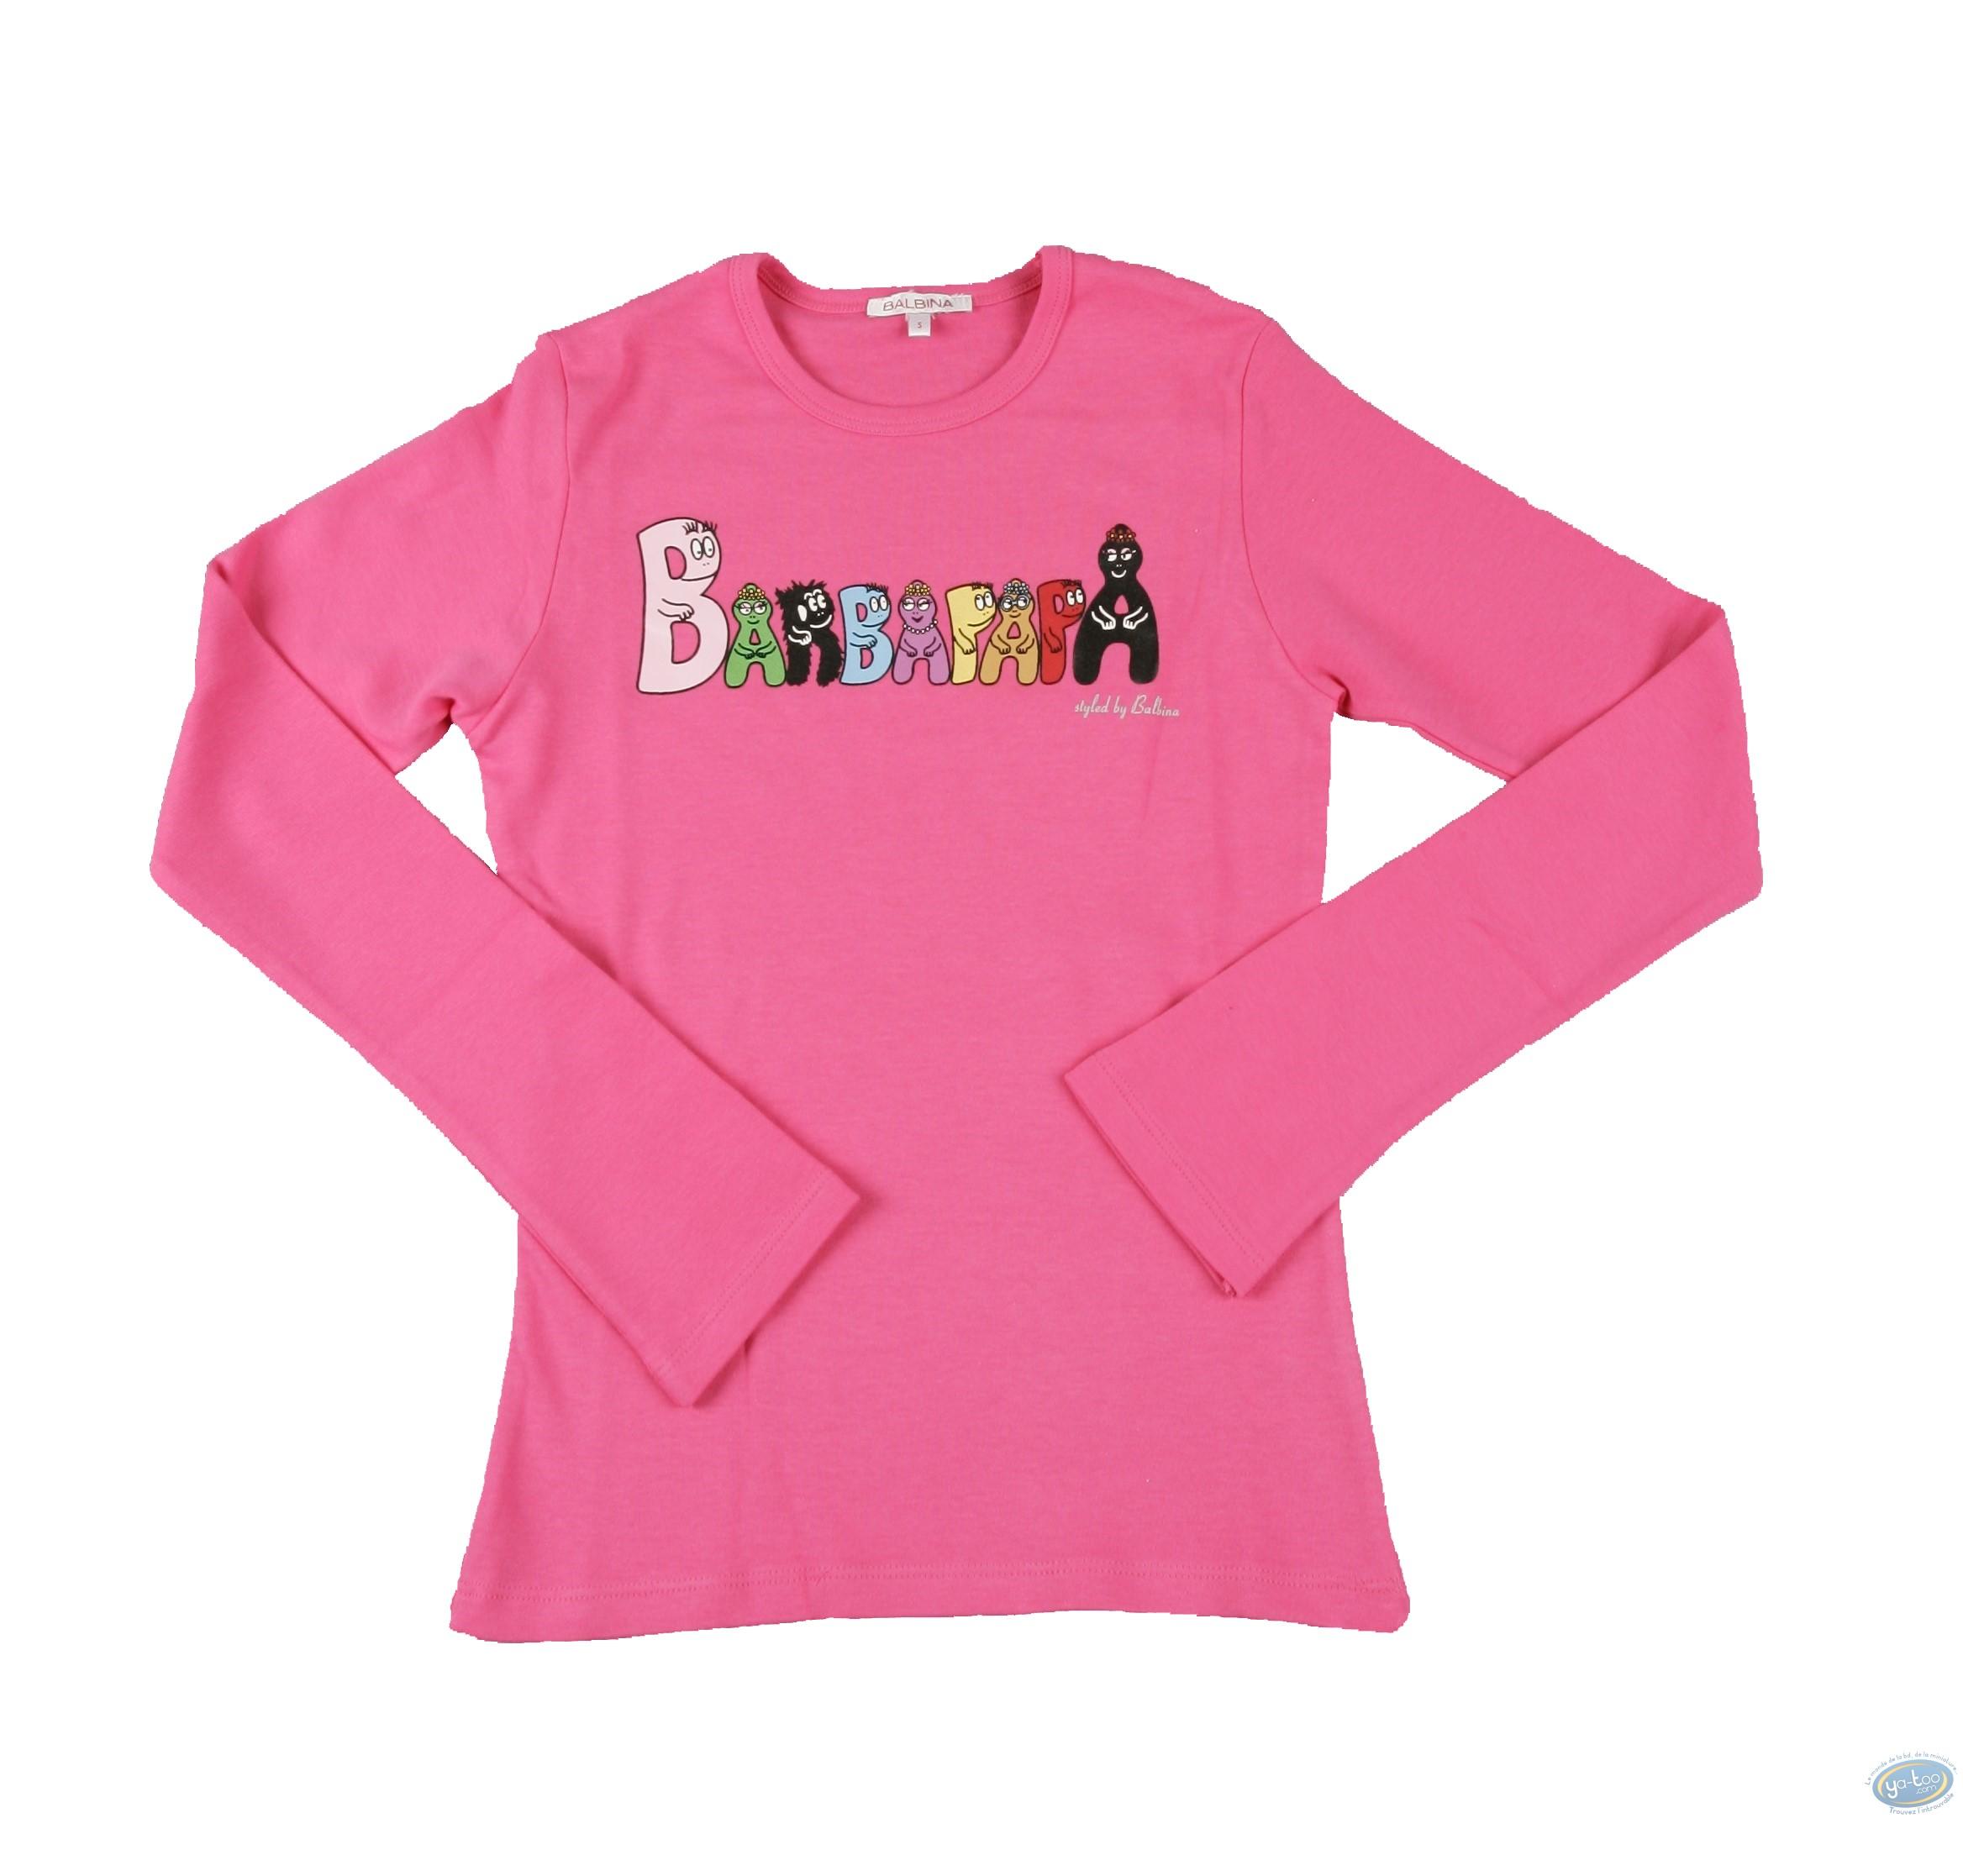 Vêtement, Barbapapa : T-shirt manches longues rose Barbapapa: taille M, logo